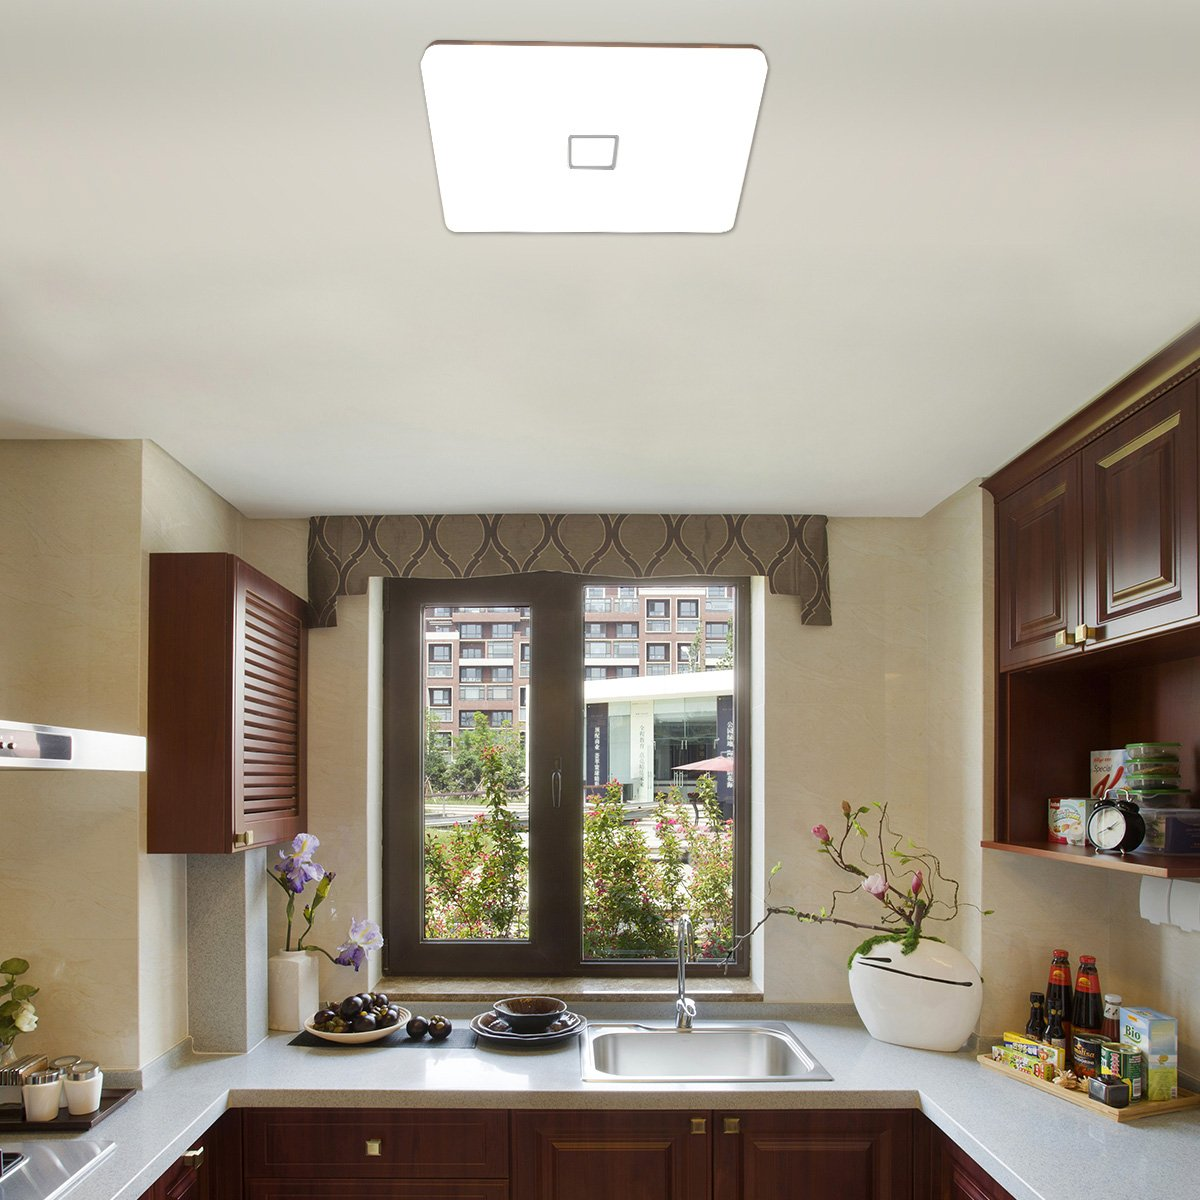 Öuesen LED 24W lámpara de techo resistente al agua moderna LED luz de techo Cuadrado delgada 2050lm regulable 3000K-5000K-4000K para baño ...